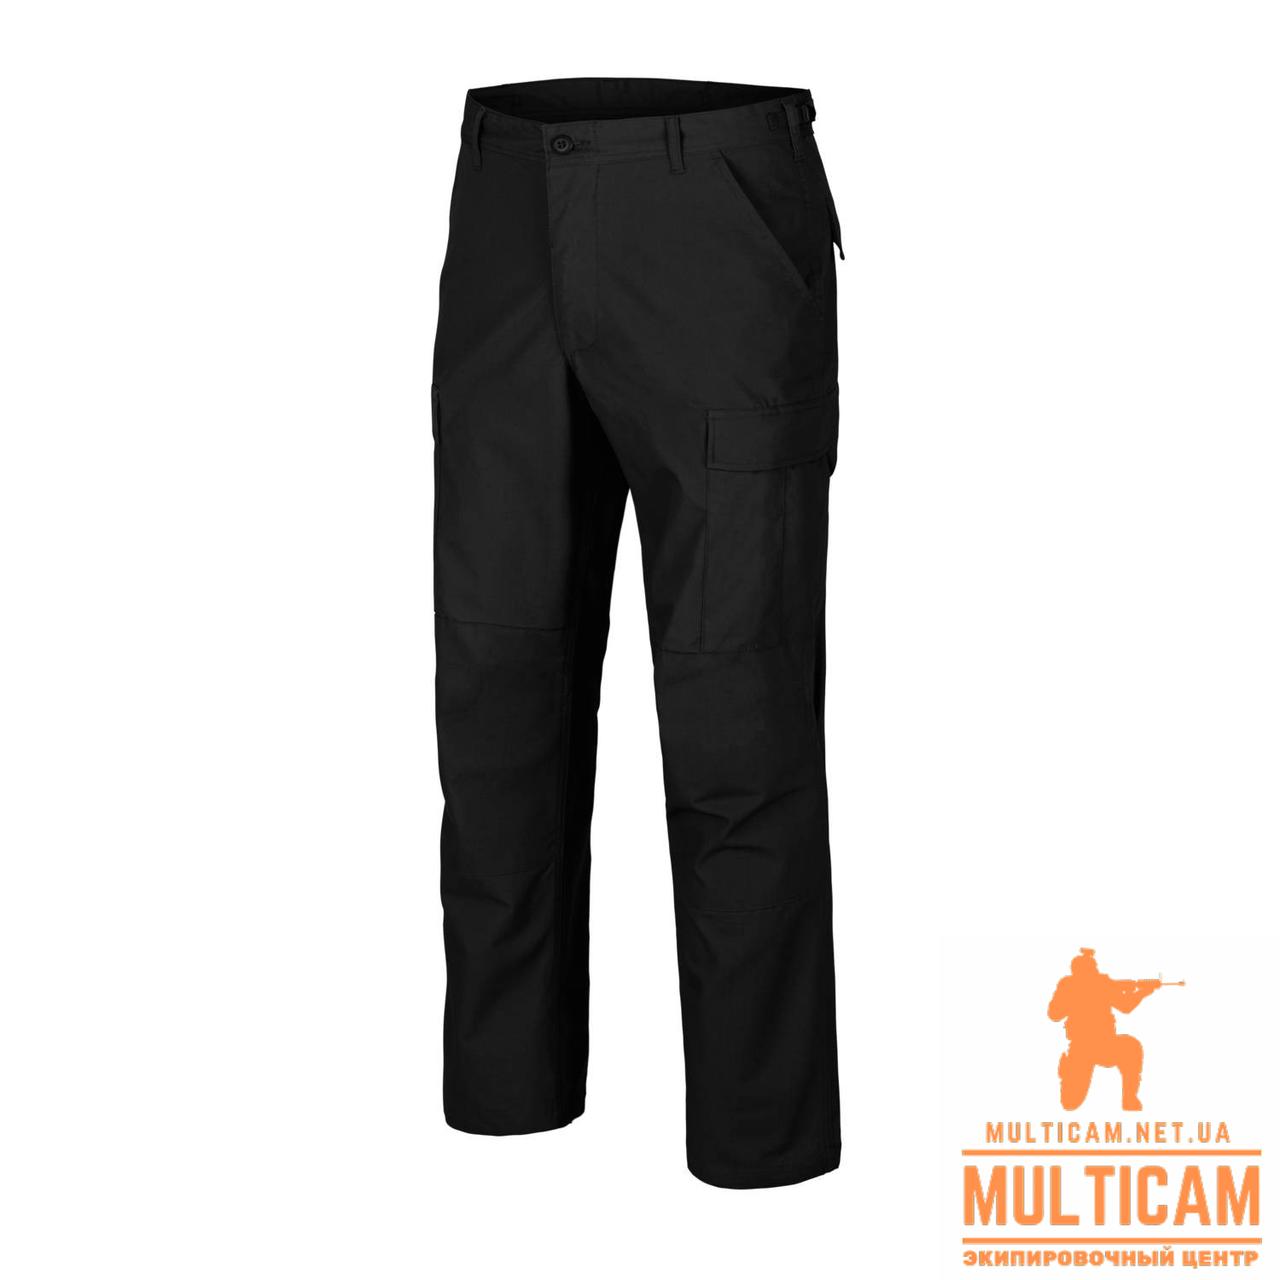 Брюки Helikon-Tex® BDU Pants - PolyCotton Ripstop - Black